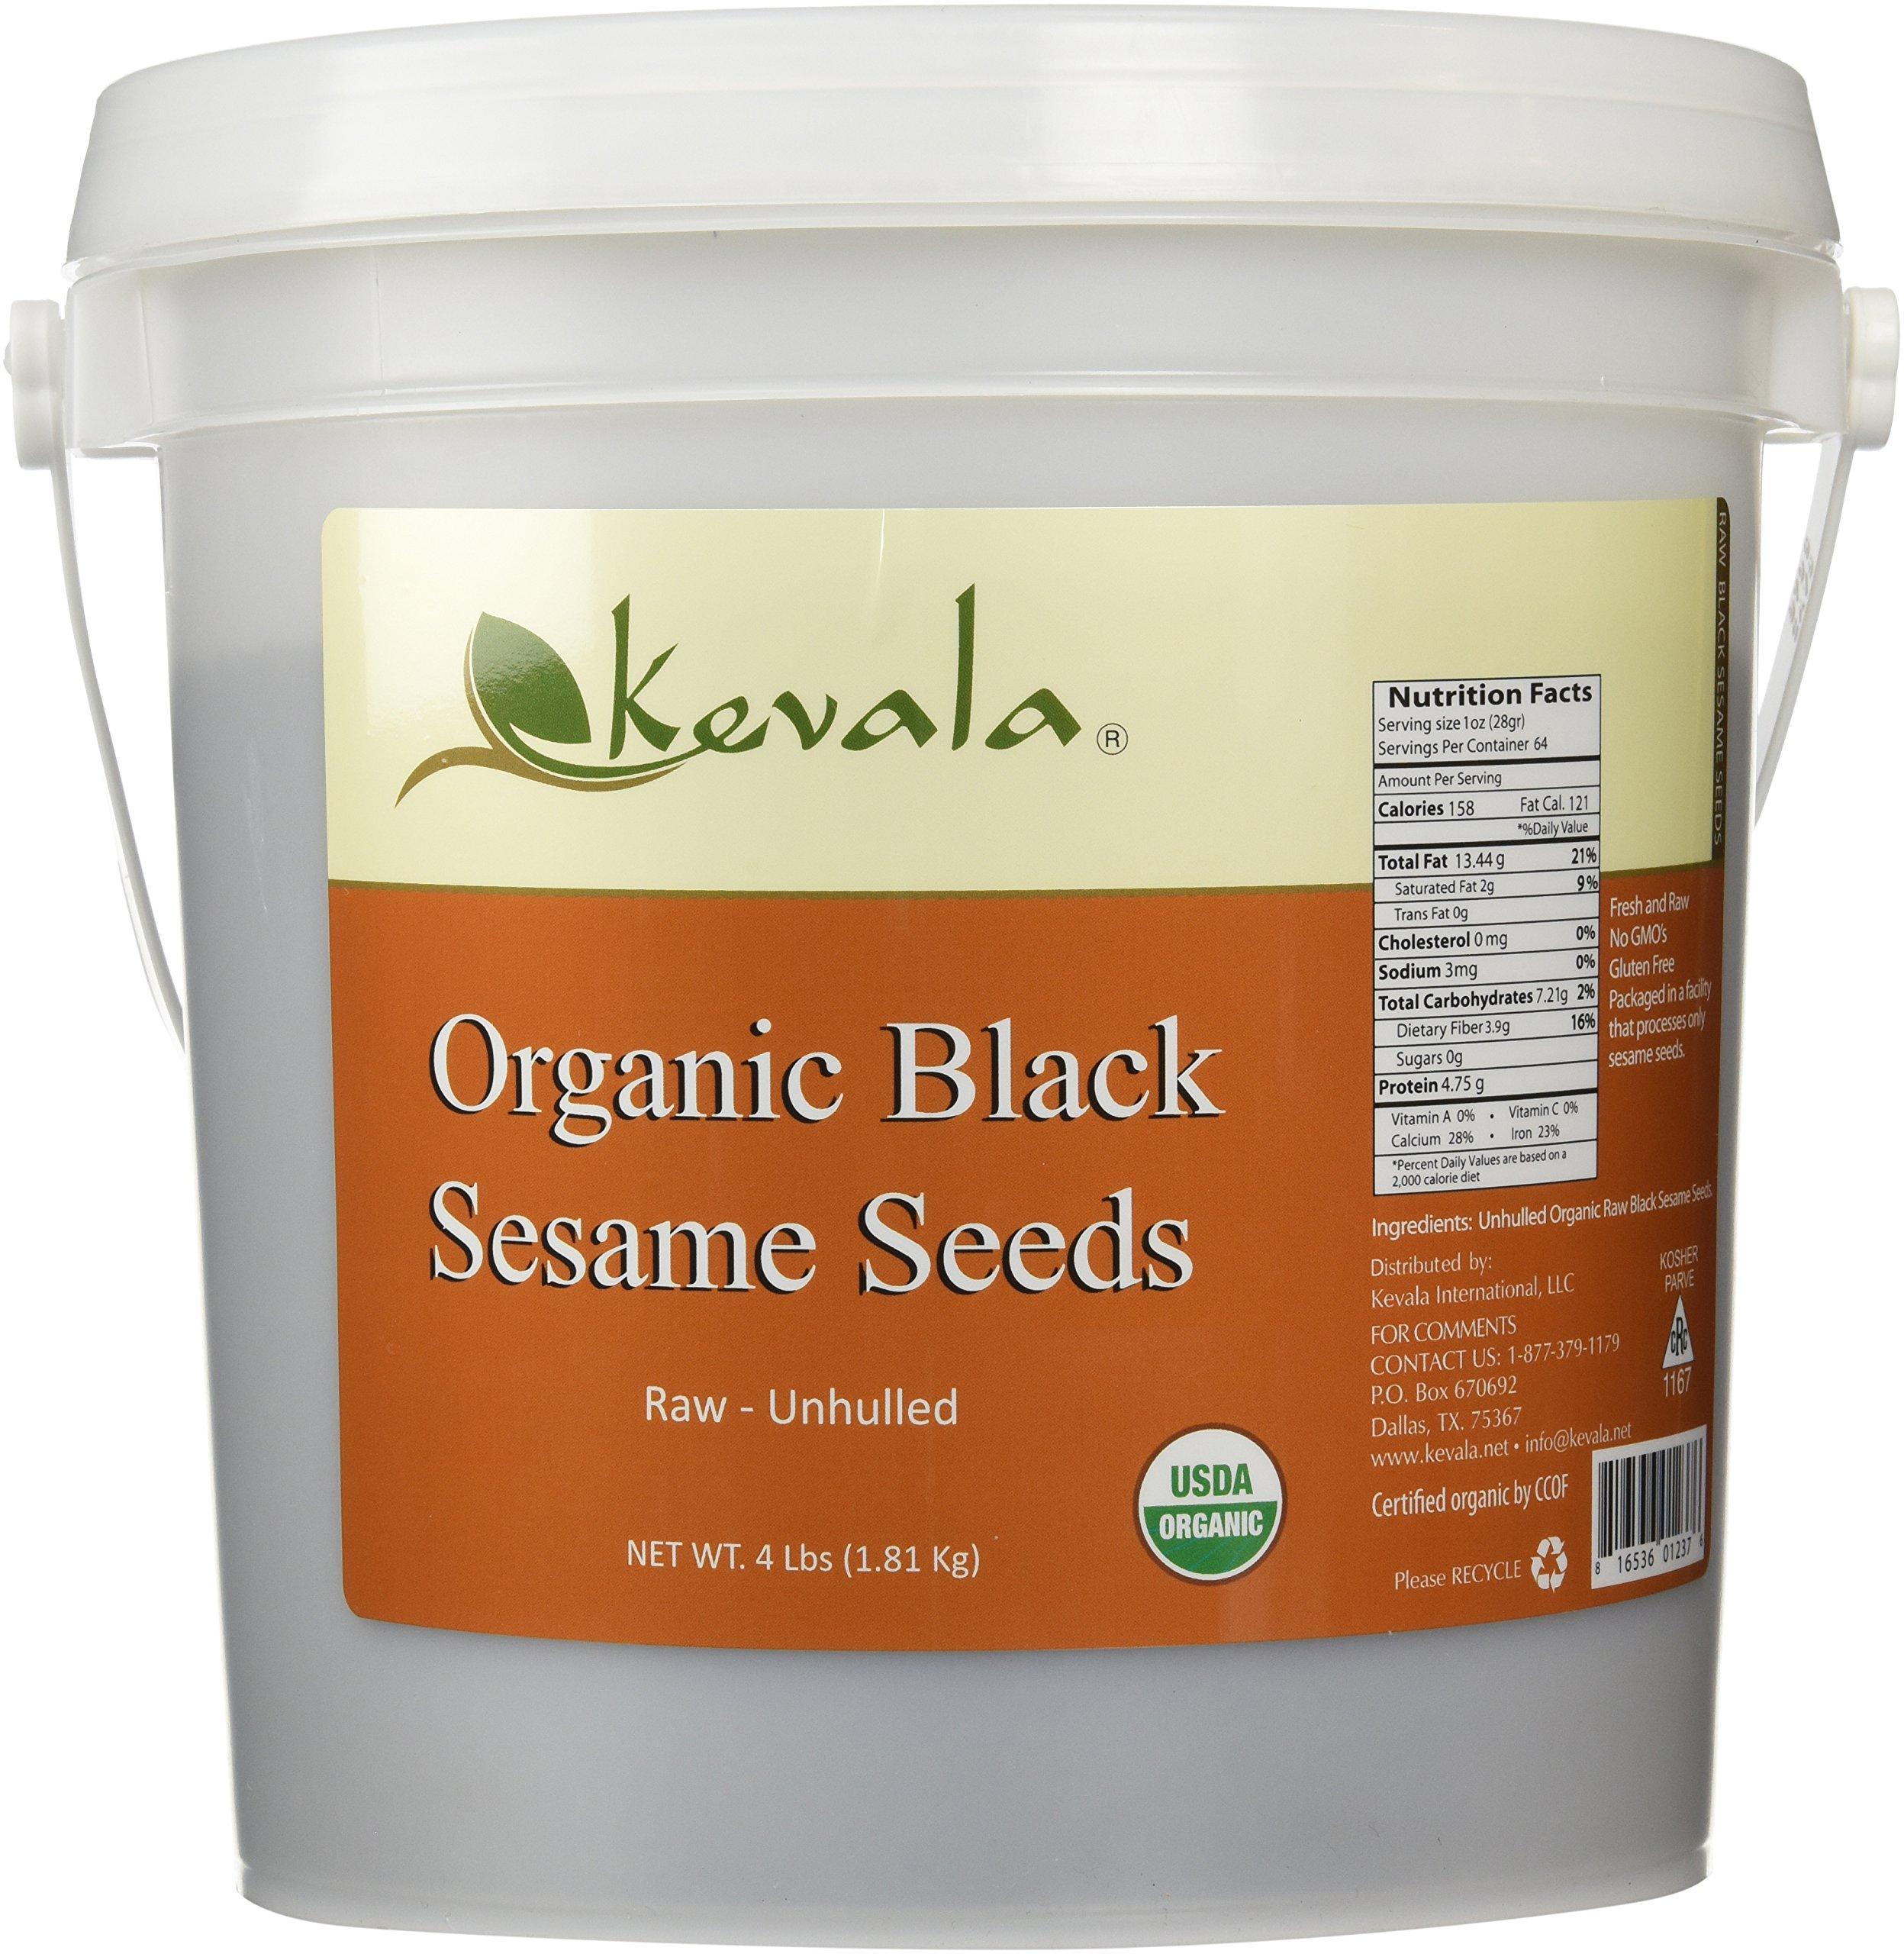 Kevala Organic Black Sesame Seeds 4Lbs (RAW)